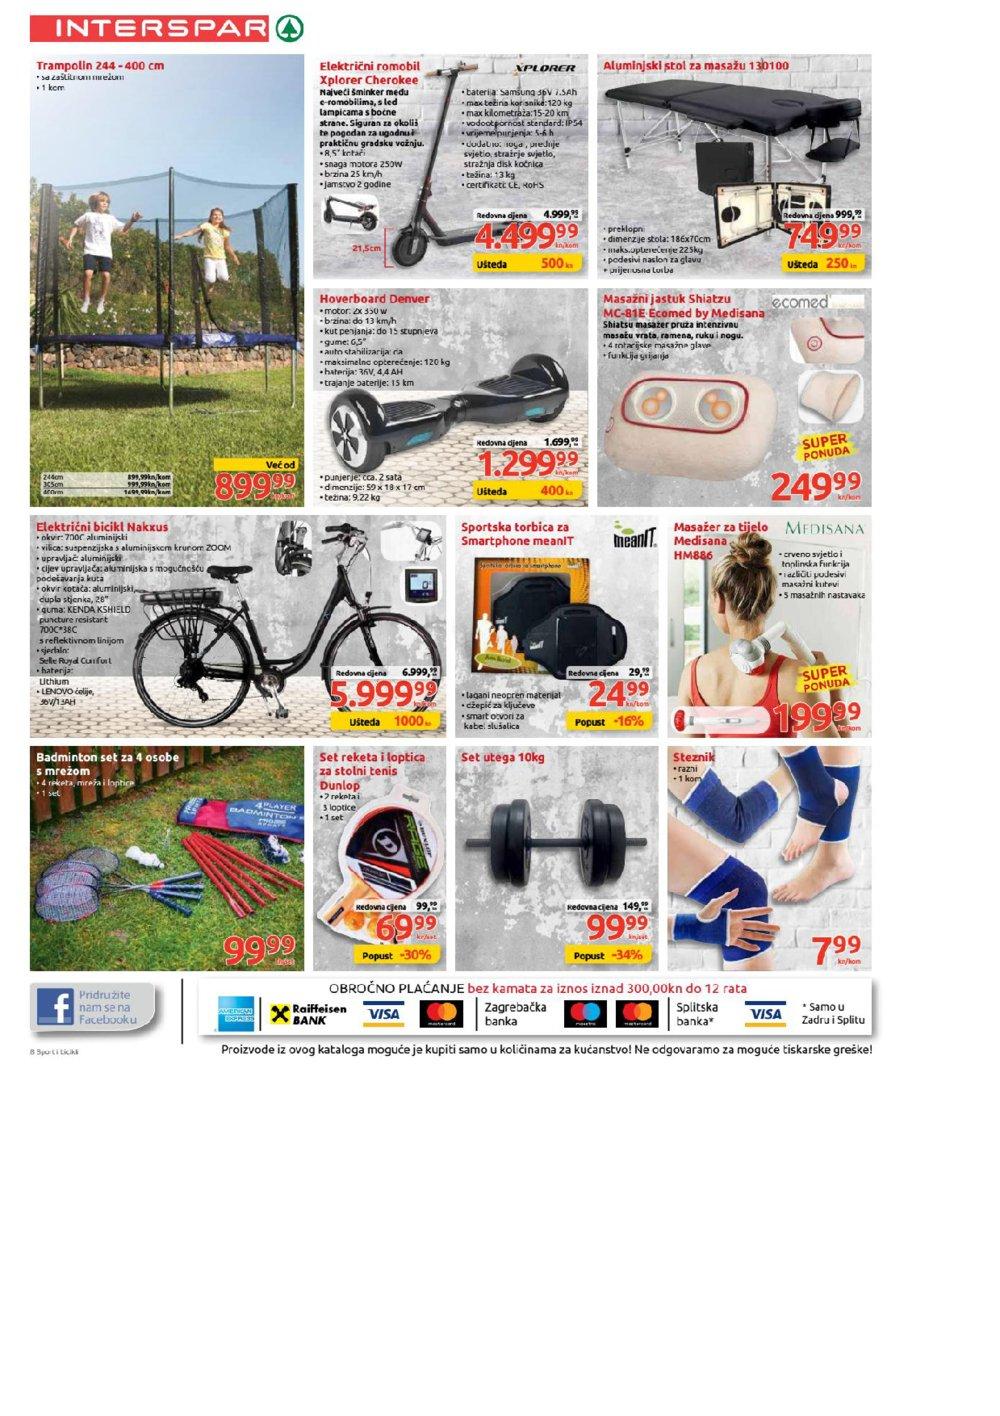 Interspar katalog Bicikli 13.03.-16.04.2019.